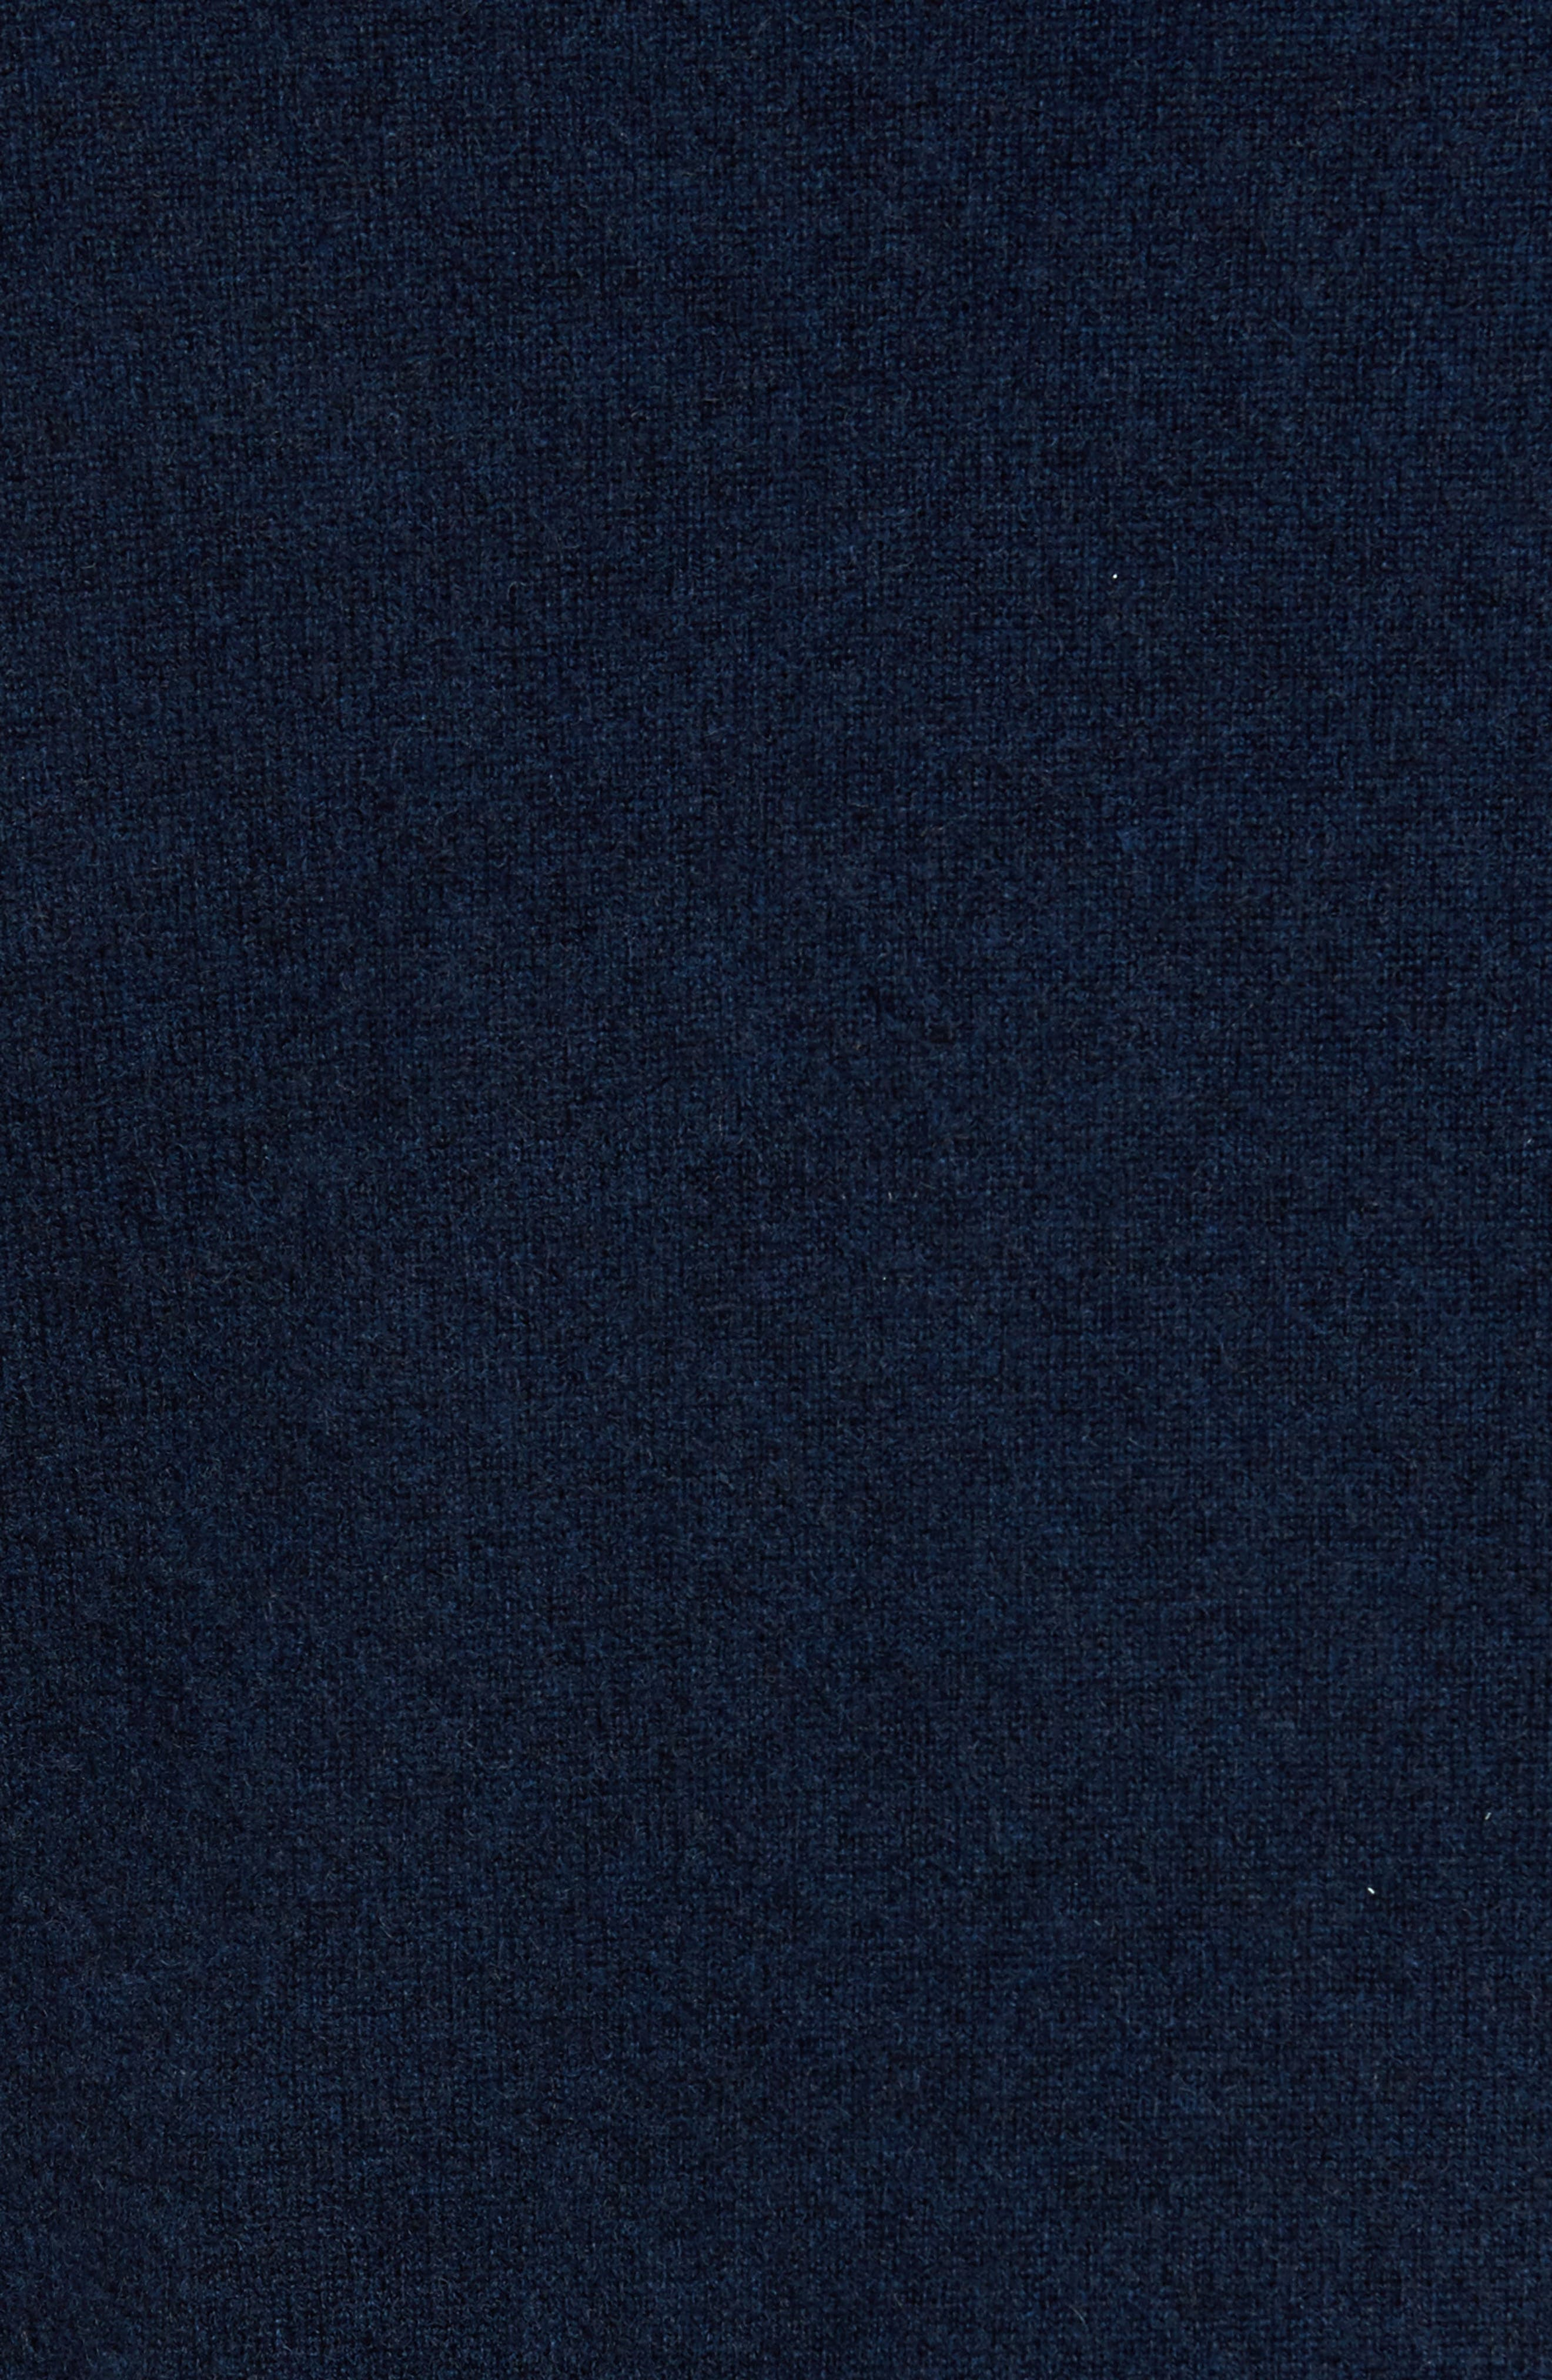 John W. Nordstrom Cashmere V-Neck Sweater,                             Alternate thumbnail 6, color,                             BLUE ESTATE HEATHER